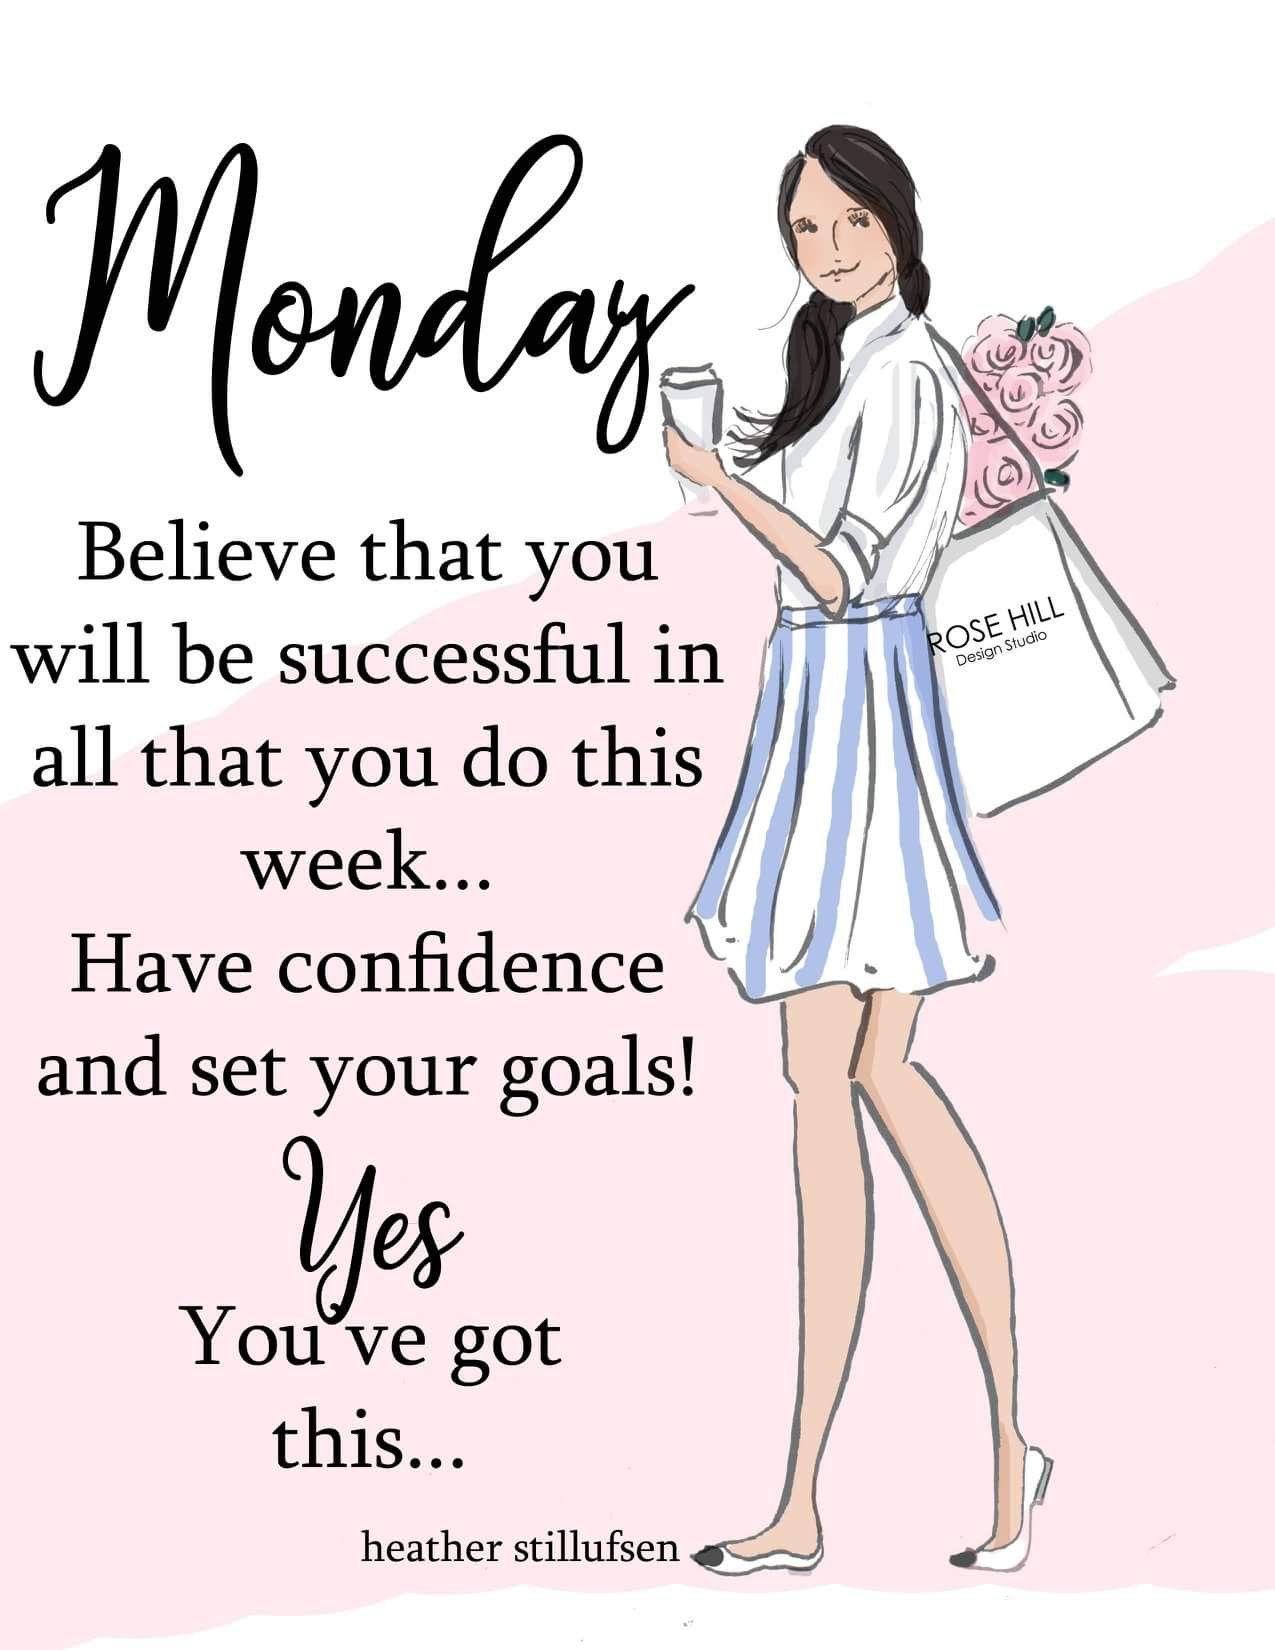 Heather stillufsen quotes, Happy monday quotes, Monday motivation quotes